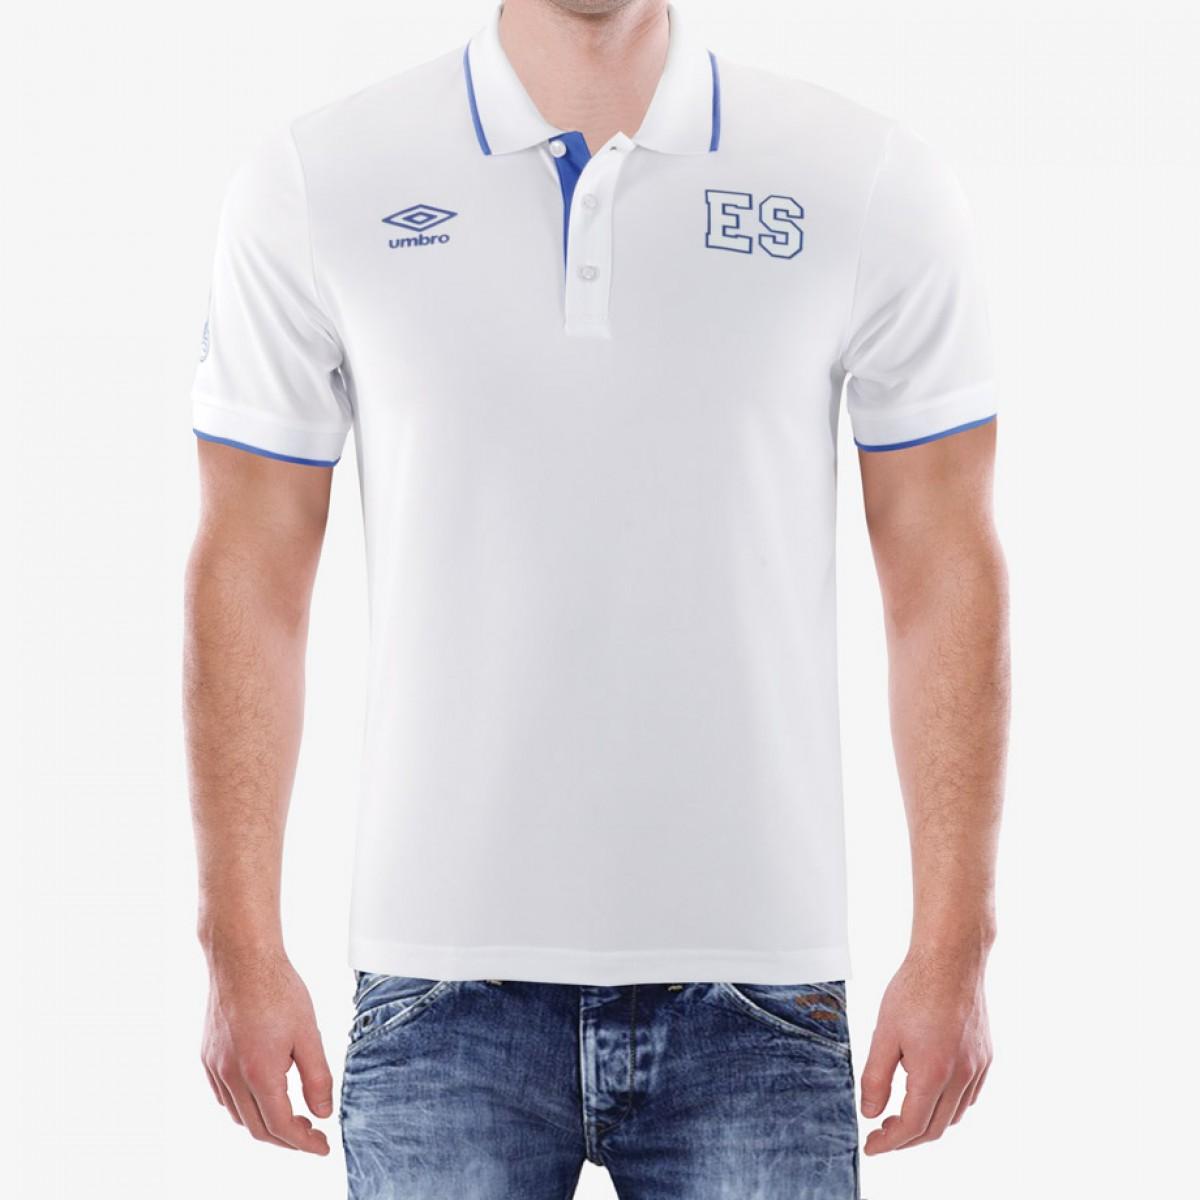 57fee2b69ab9f Camisa Polo Blanca Umbro